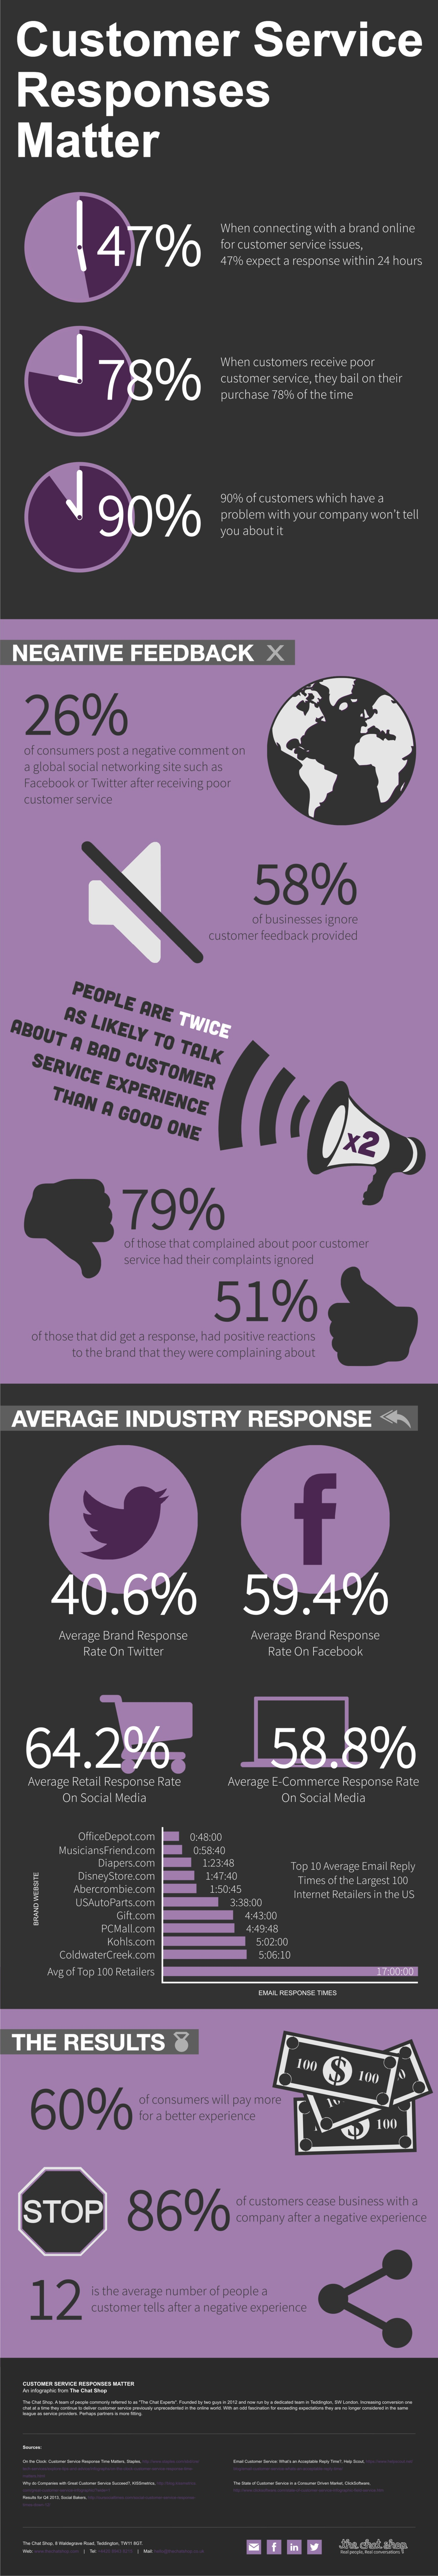 Excellent Customer Service : Customer Service Responses Matter